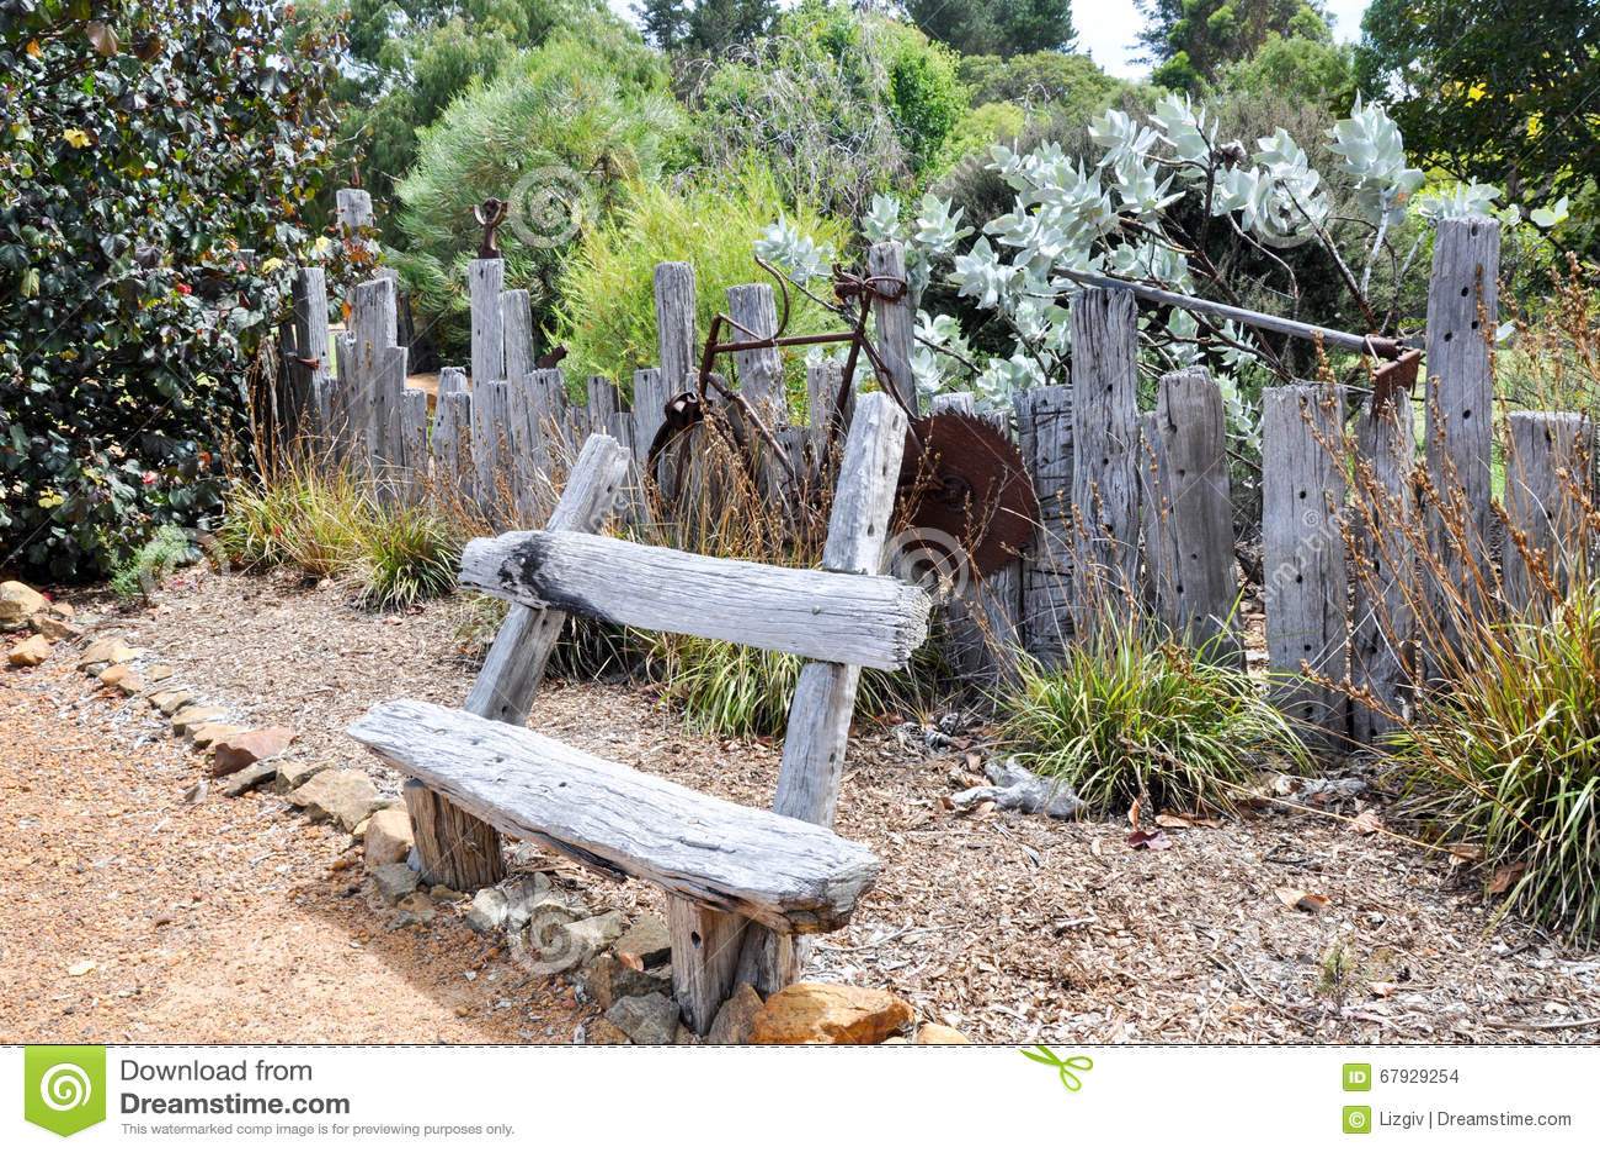 editorial stock photo download rustic garden decor